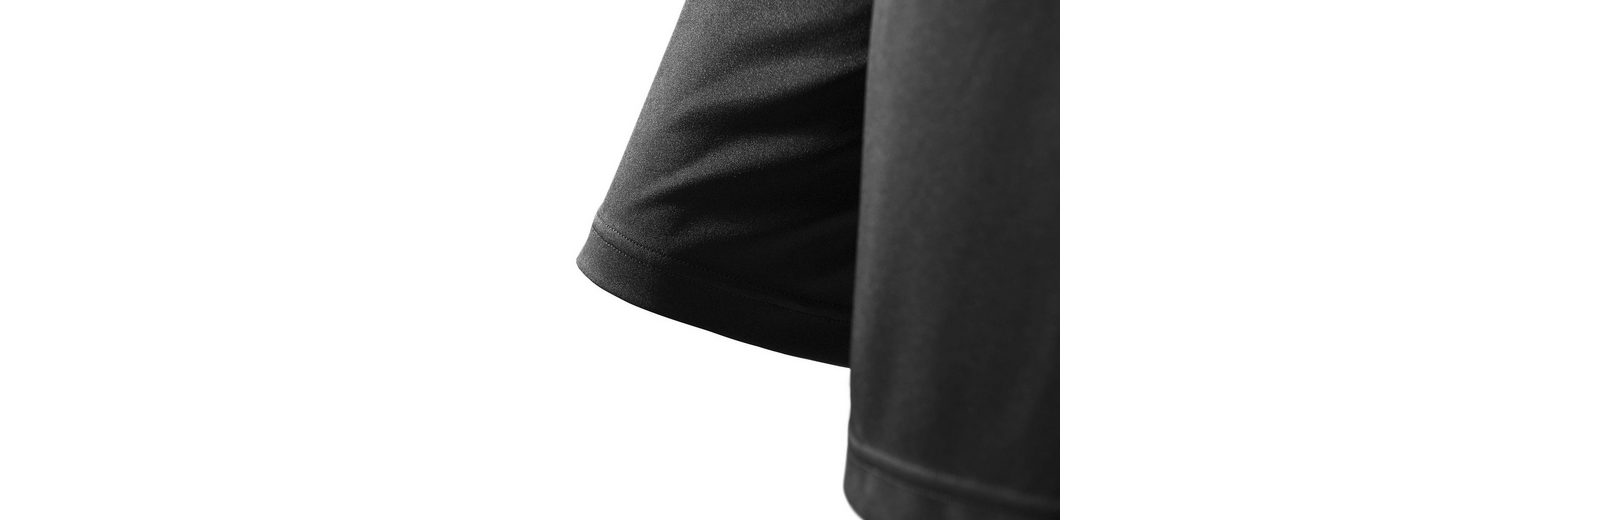 Joy Sportswear Bermudas RORY Freies Verschiffen Truhe Finish Eastbay QrHeYRyyWa